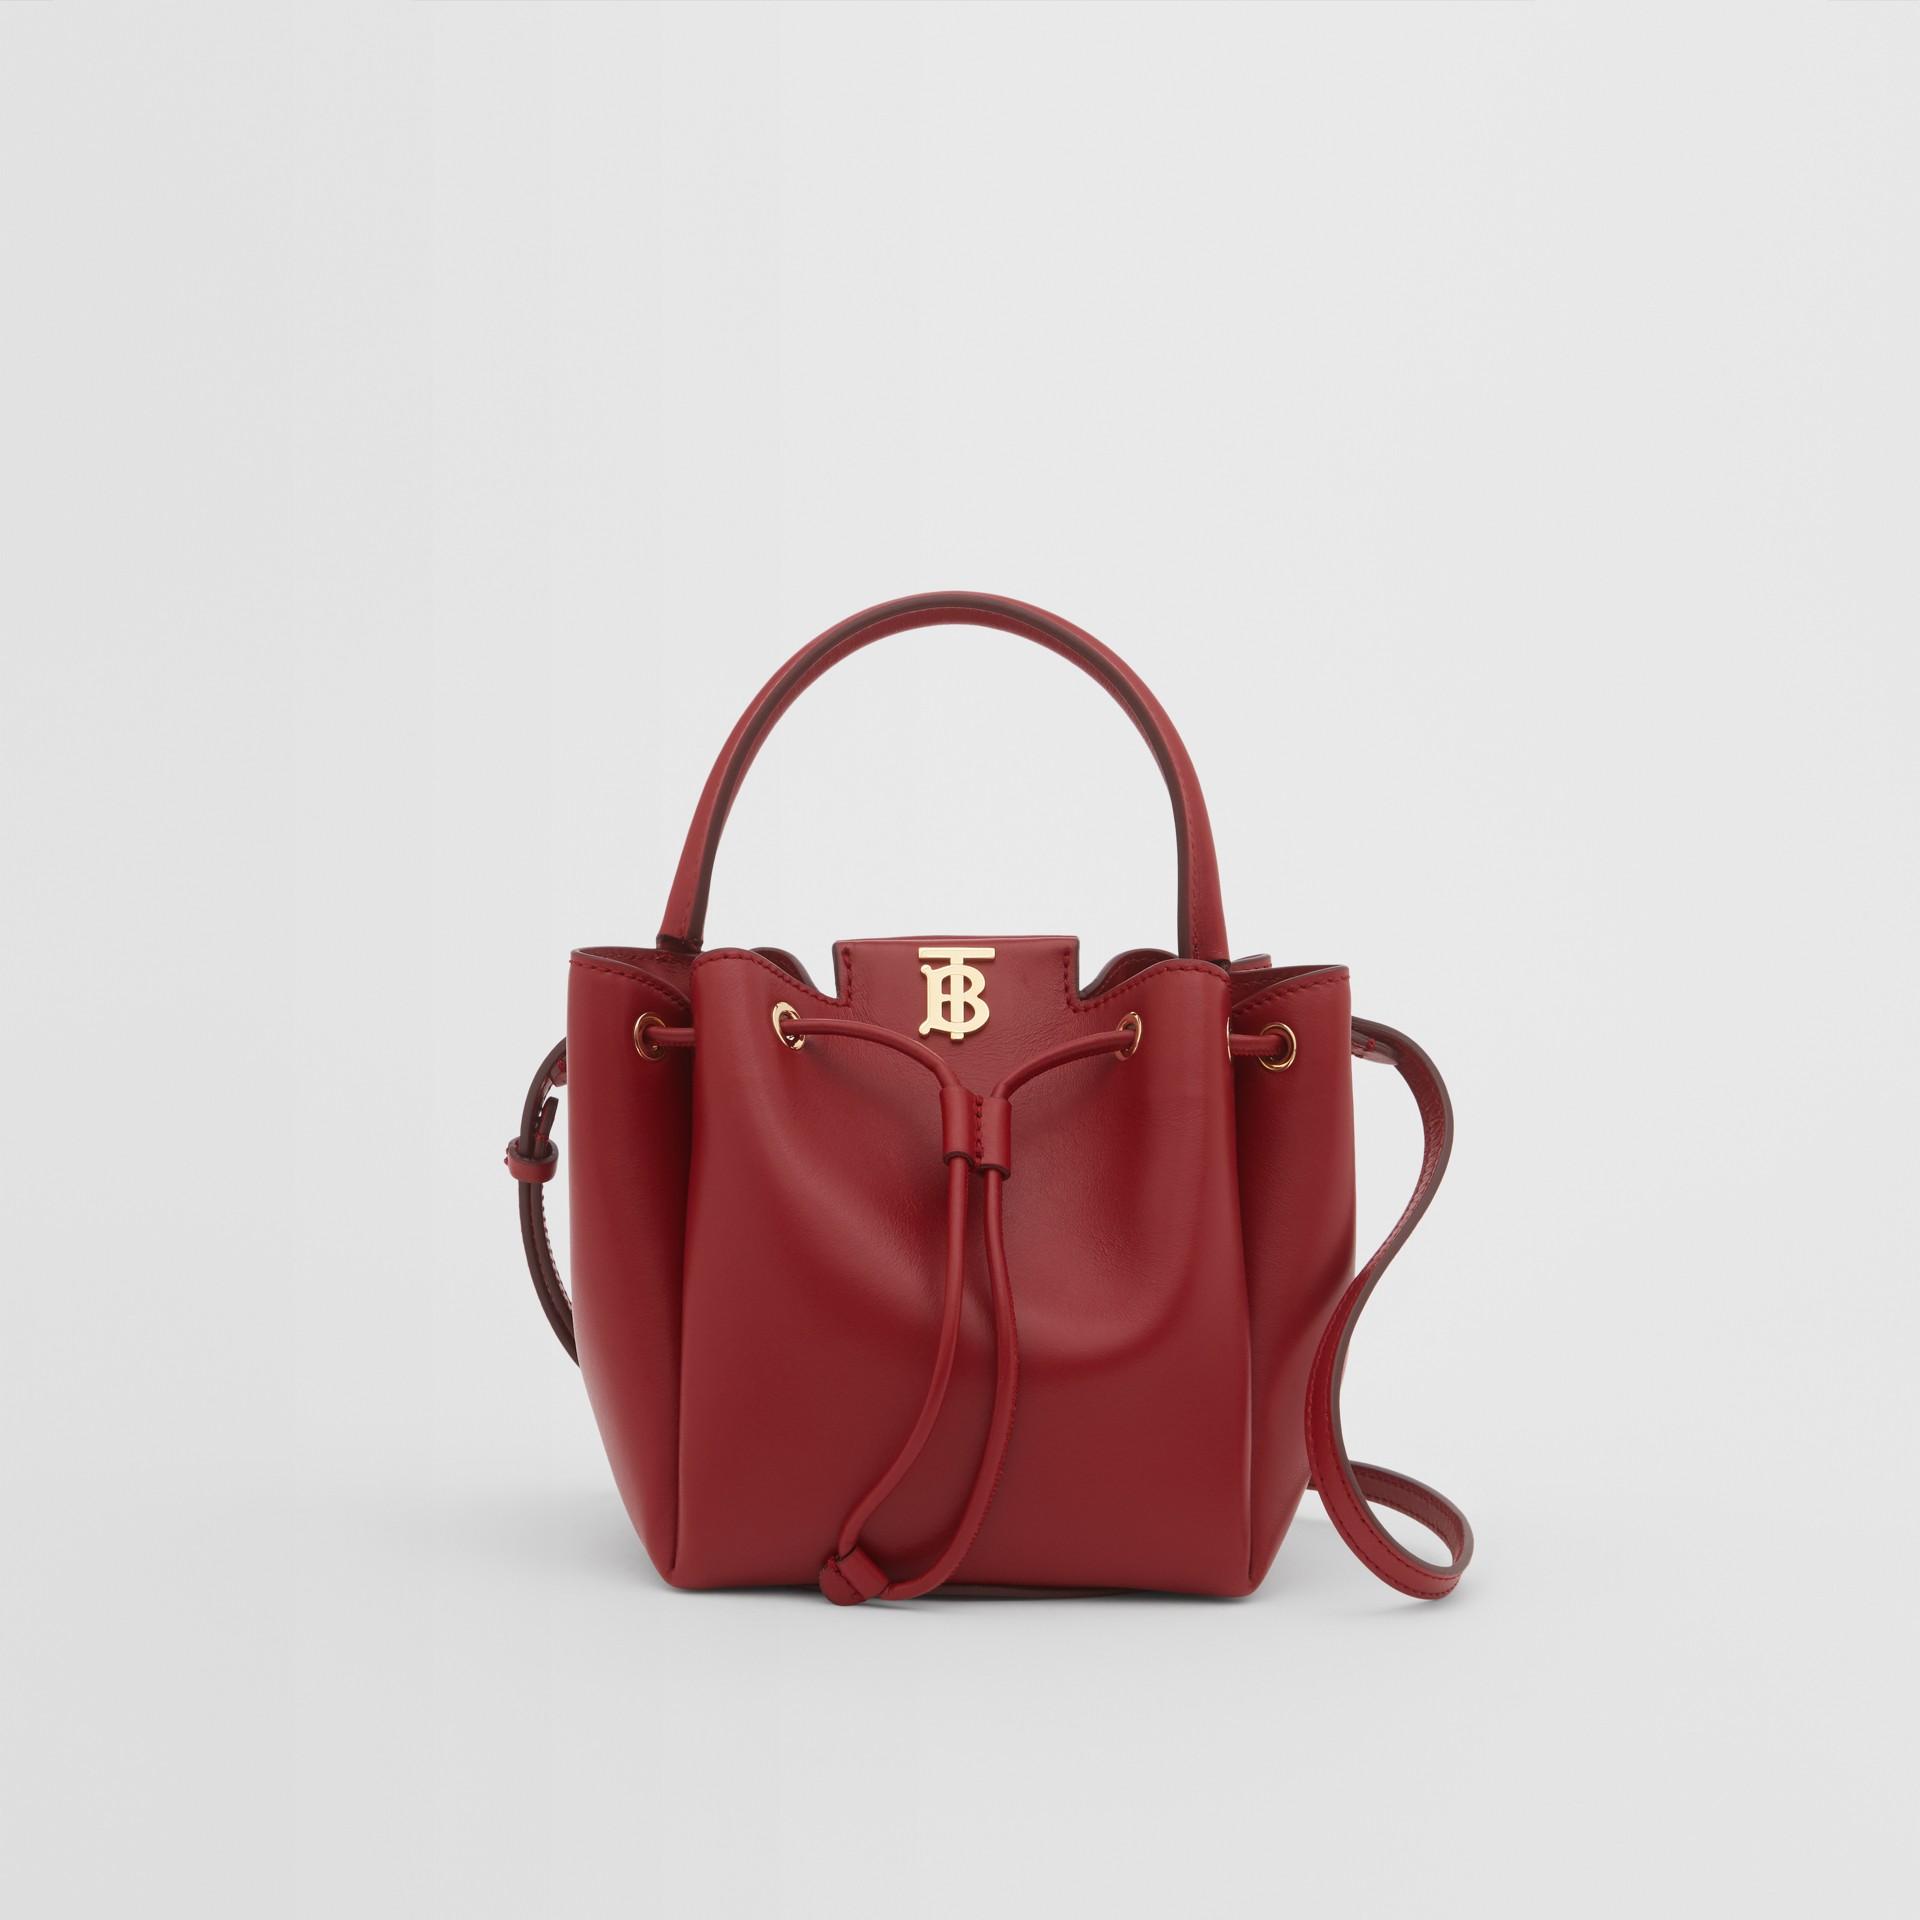 Monogram Motif Leather Bucket Bag in Dark Carmine - Women | Burberry United States - gallery image 0